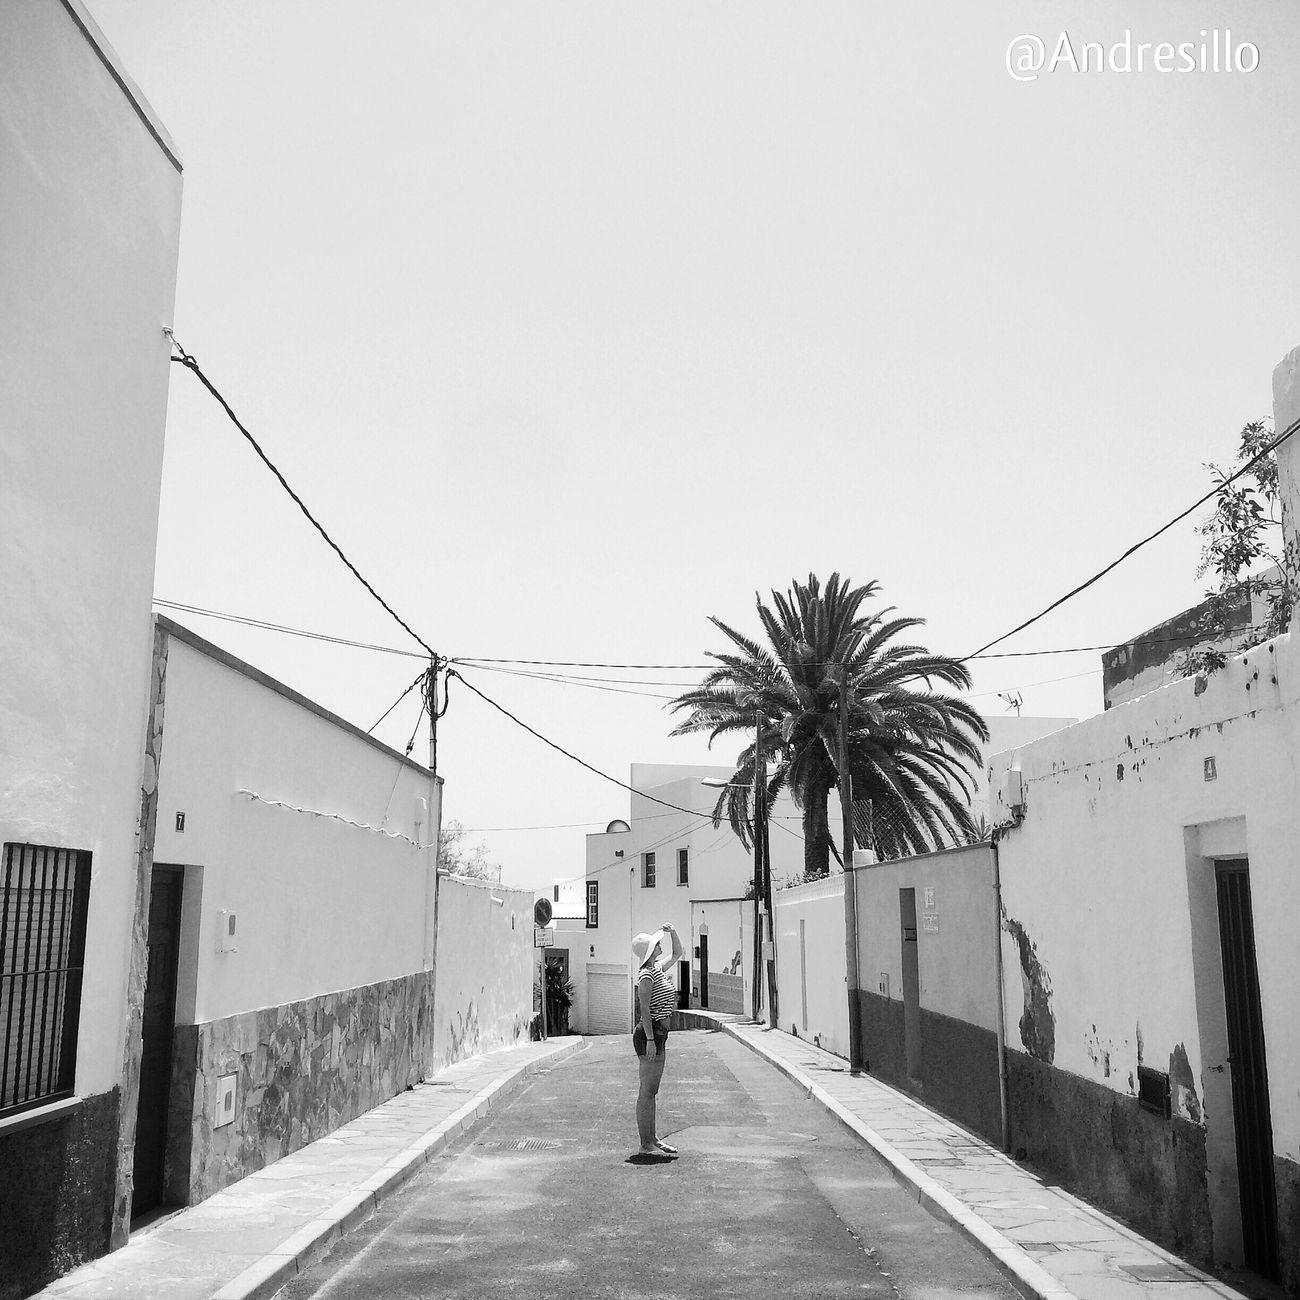 Poris. Monochrome EyeEm Best Shots - Black + White IPhoneography Shootermag EyeEm Best Shots Blackandwhite Photography Urbanphotography Architecture_bw Architecture_collection Urban Landscape